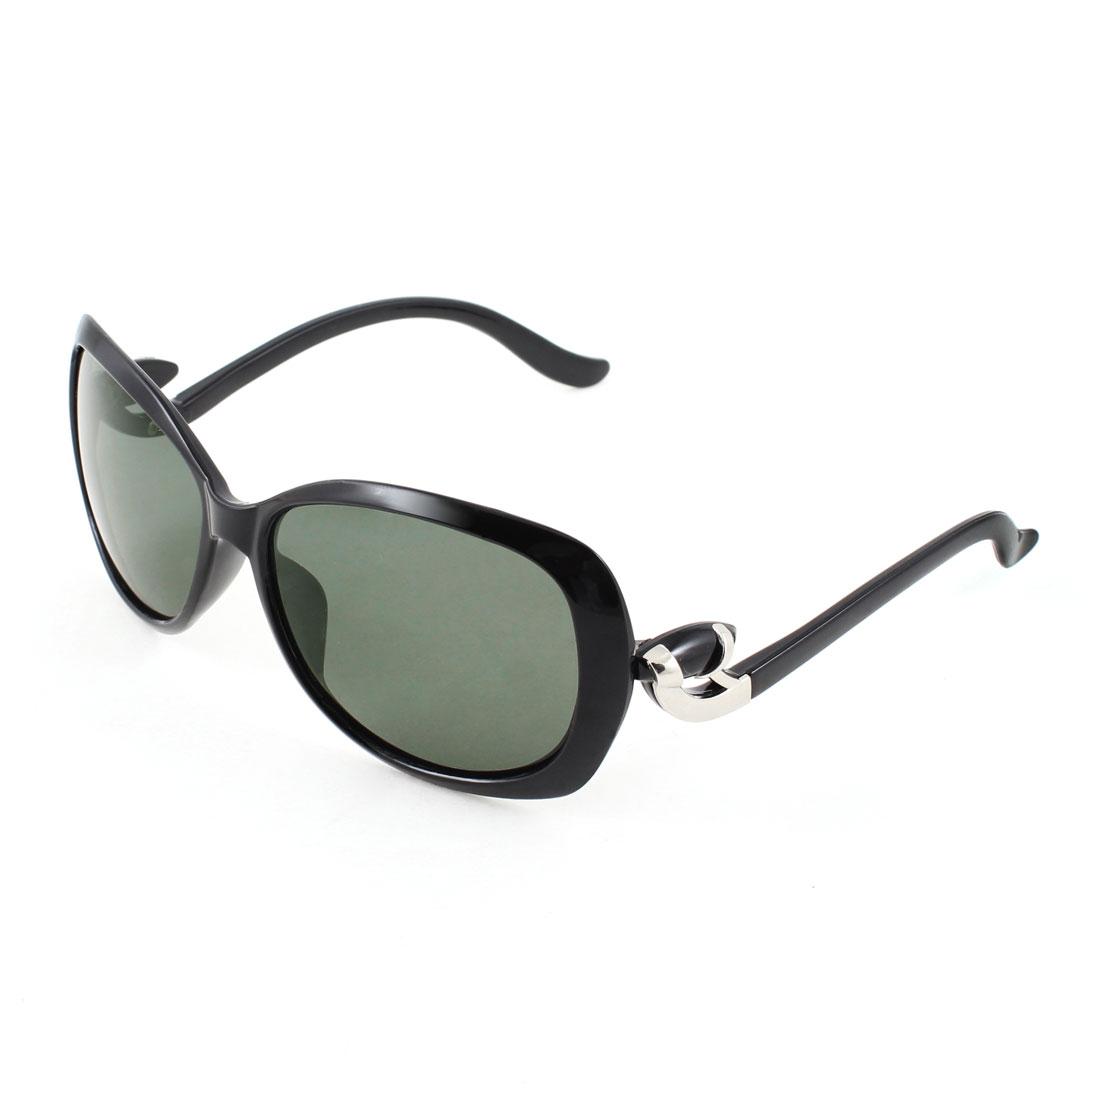 Teardrop Shape Green Lens Eyeglasses Polarized Sunglasses Black for Woman Ladies